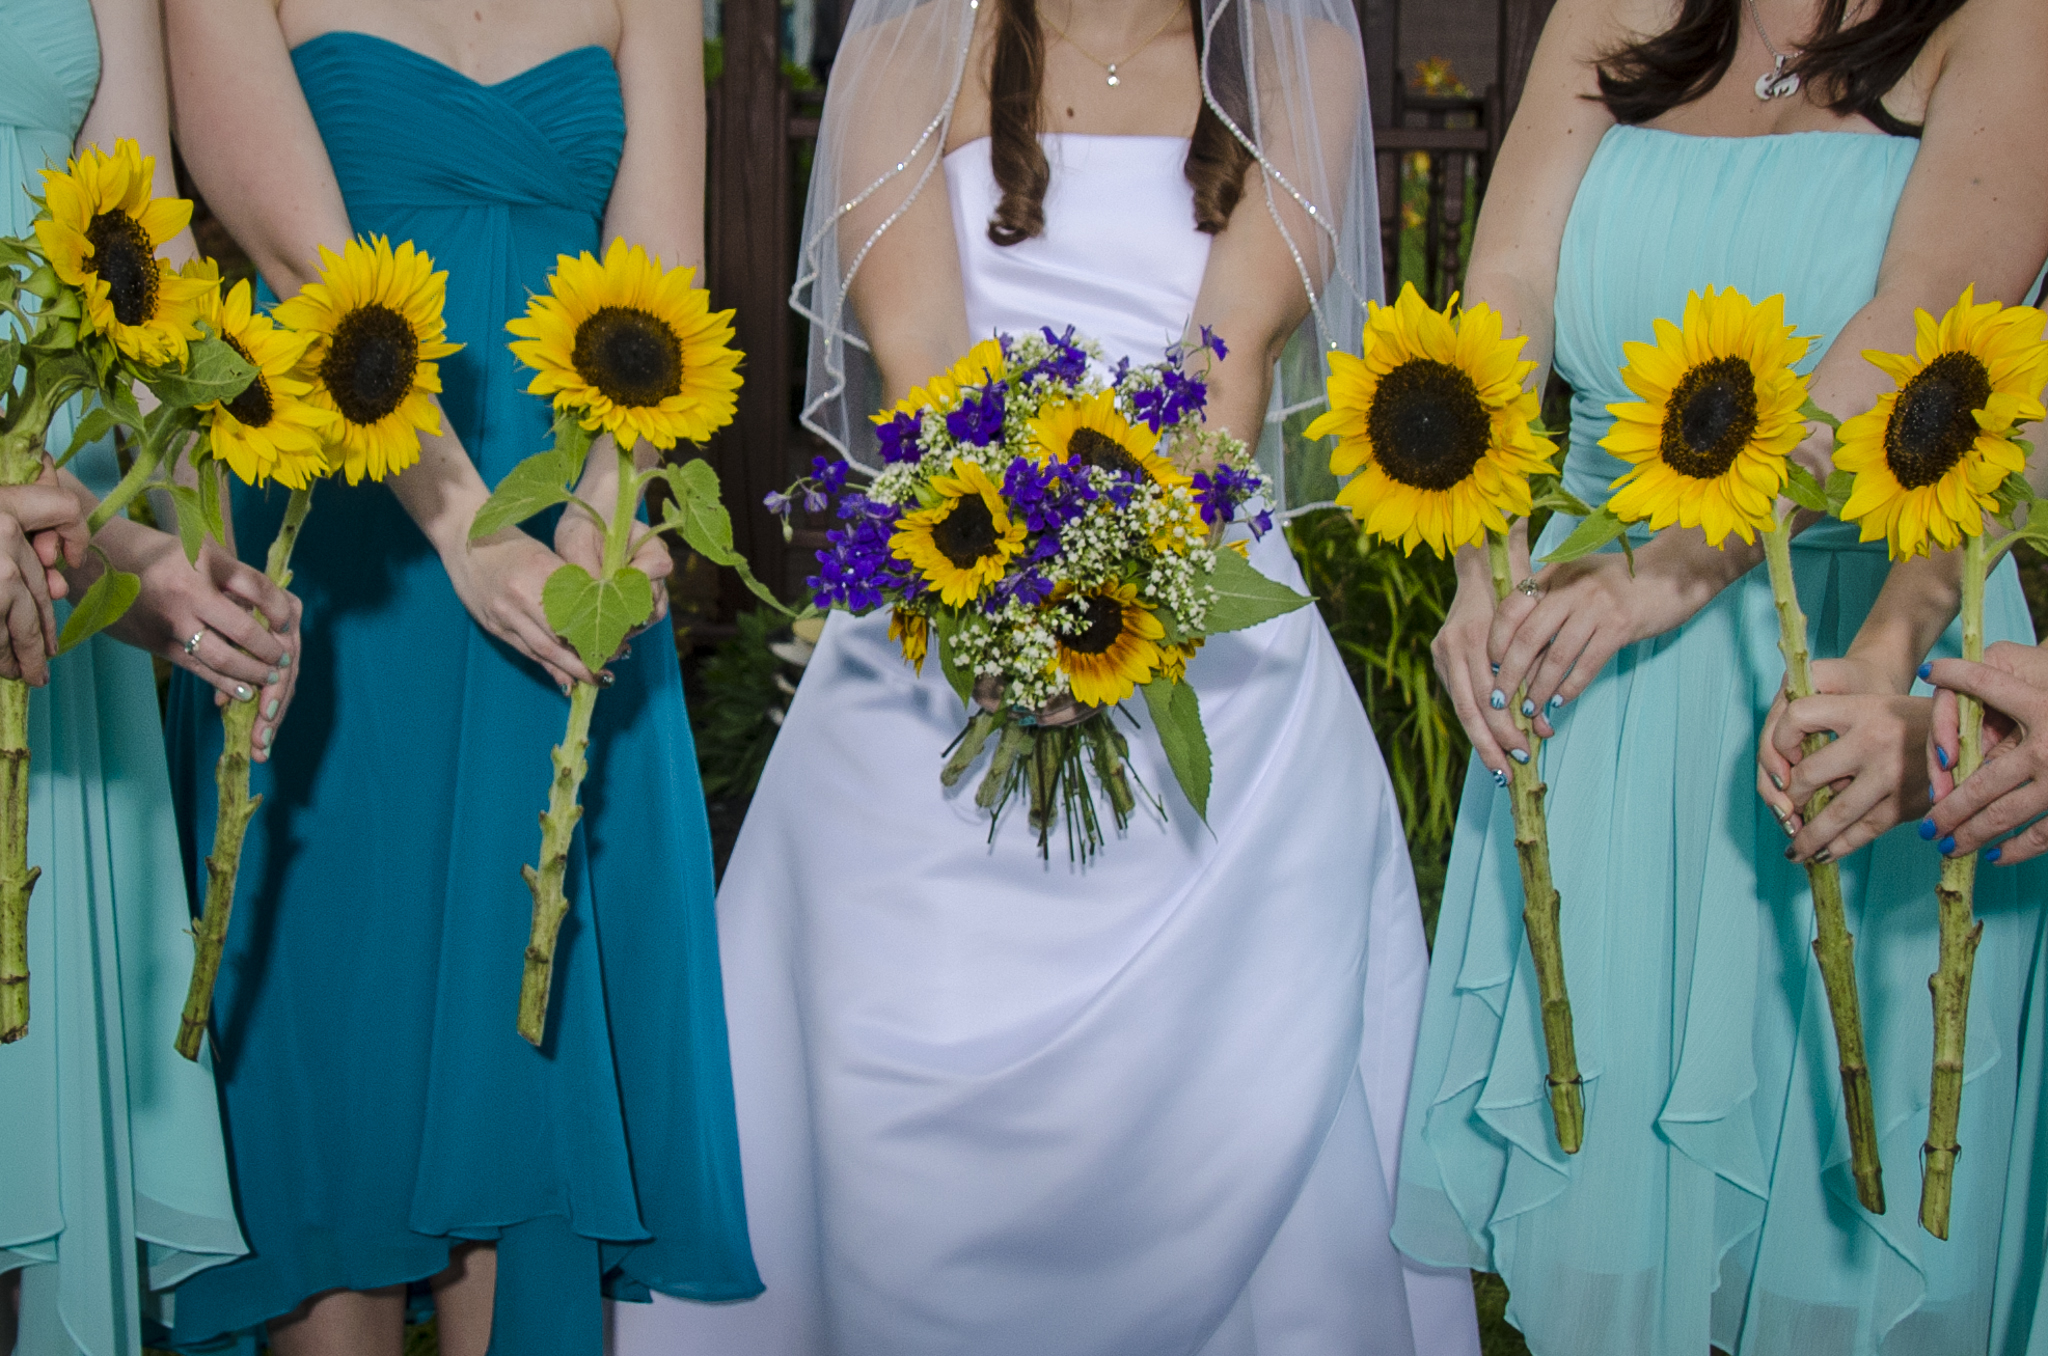 heather-carlos-july-2015-Online-WeddingParty-18.jpg